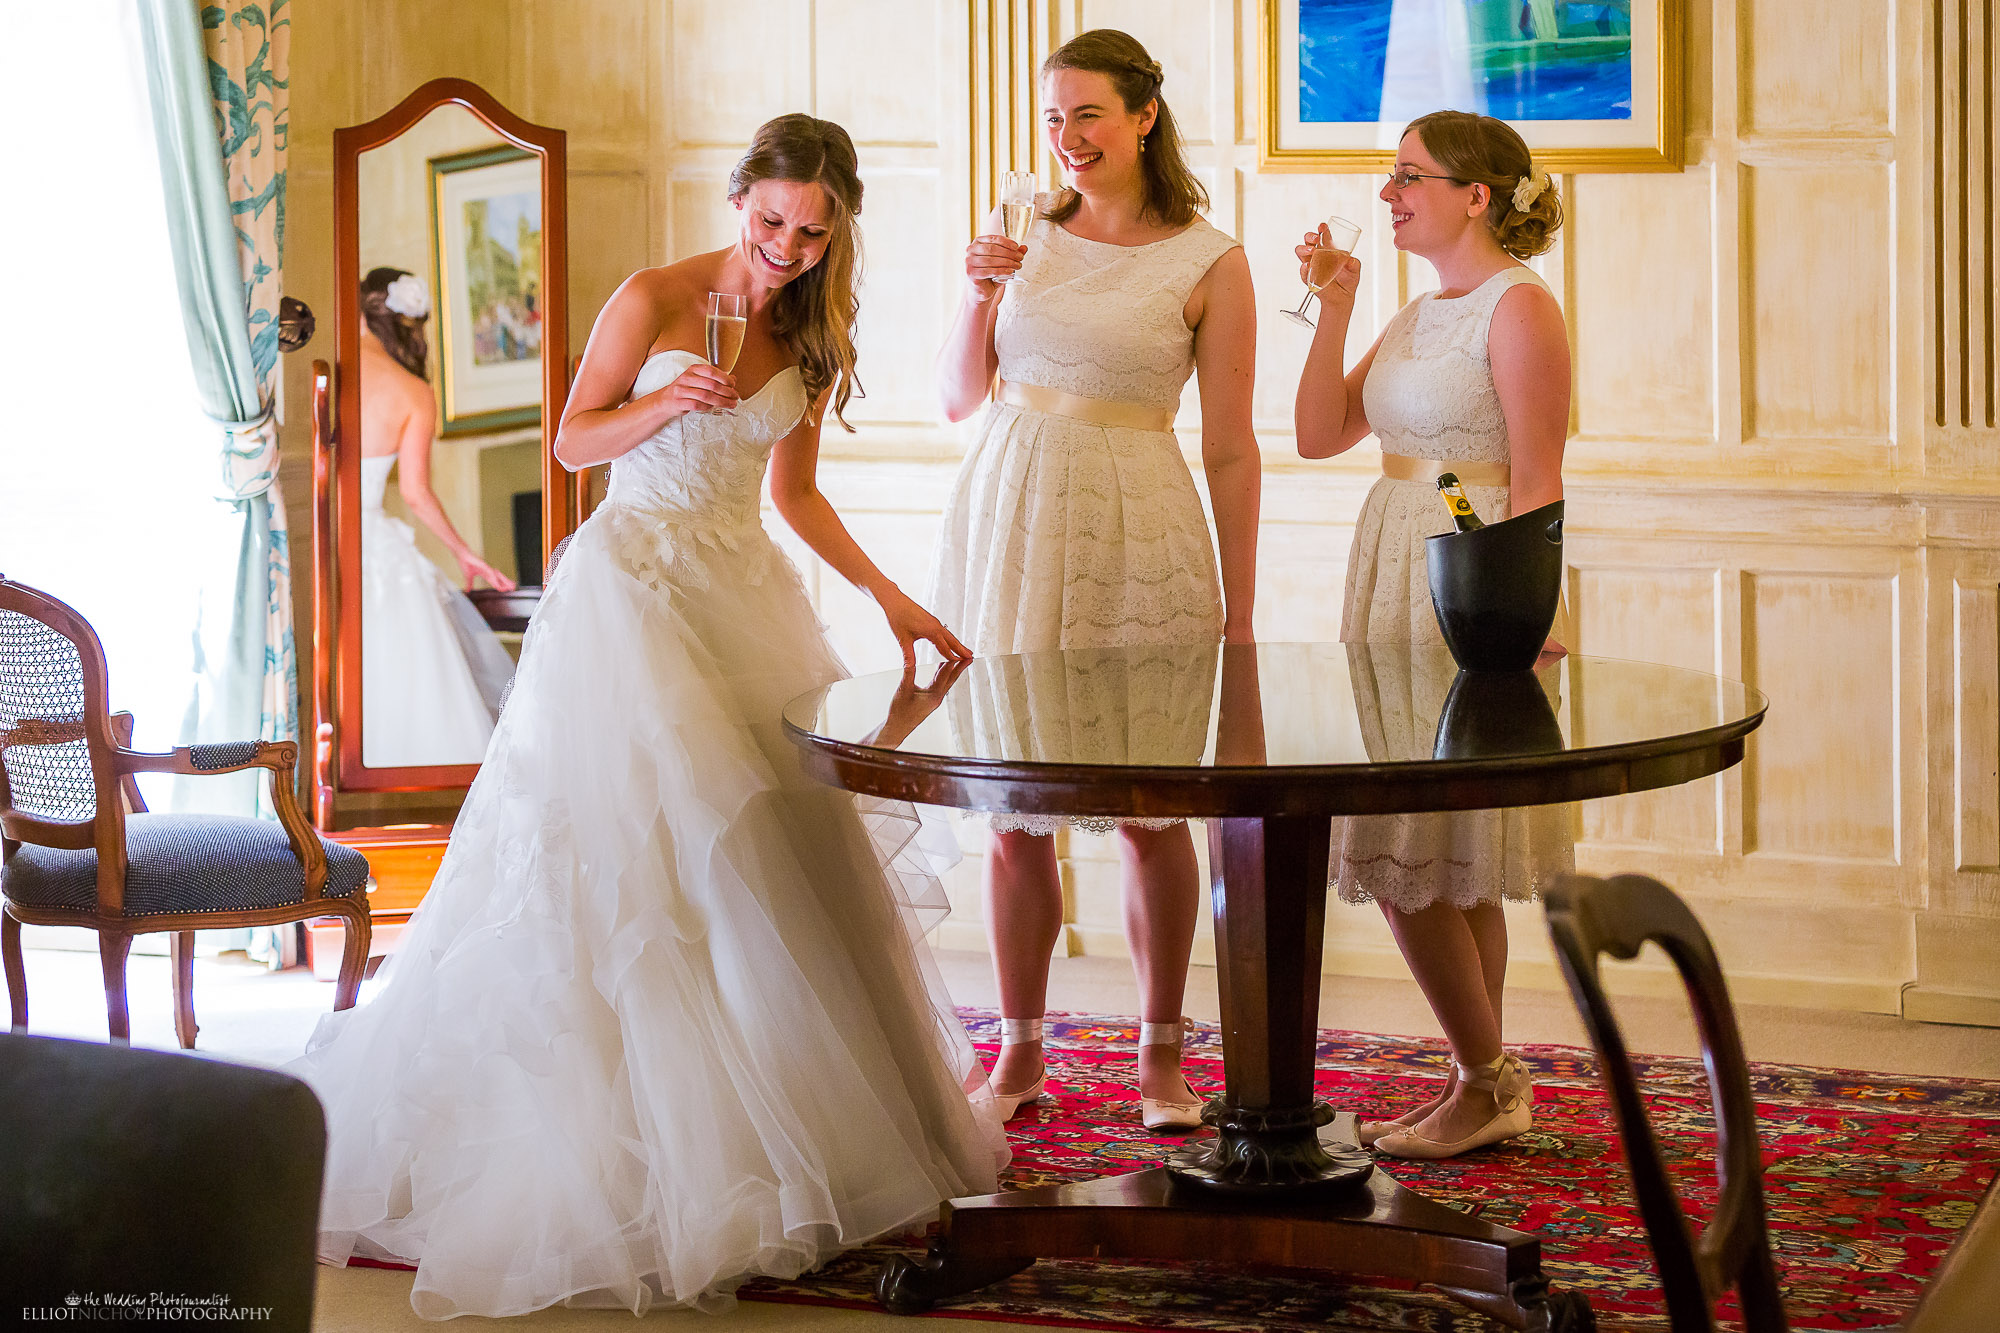 bride-champagne-bridesmaids-wedding-photographer-Newcastle